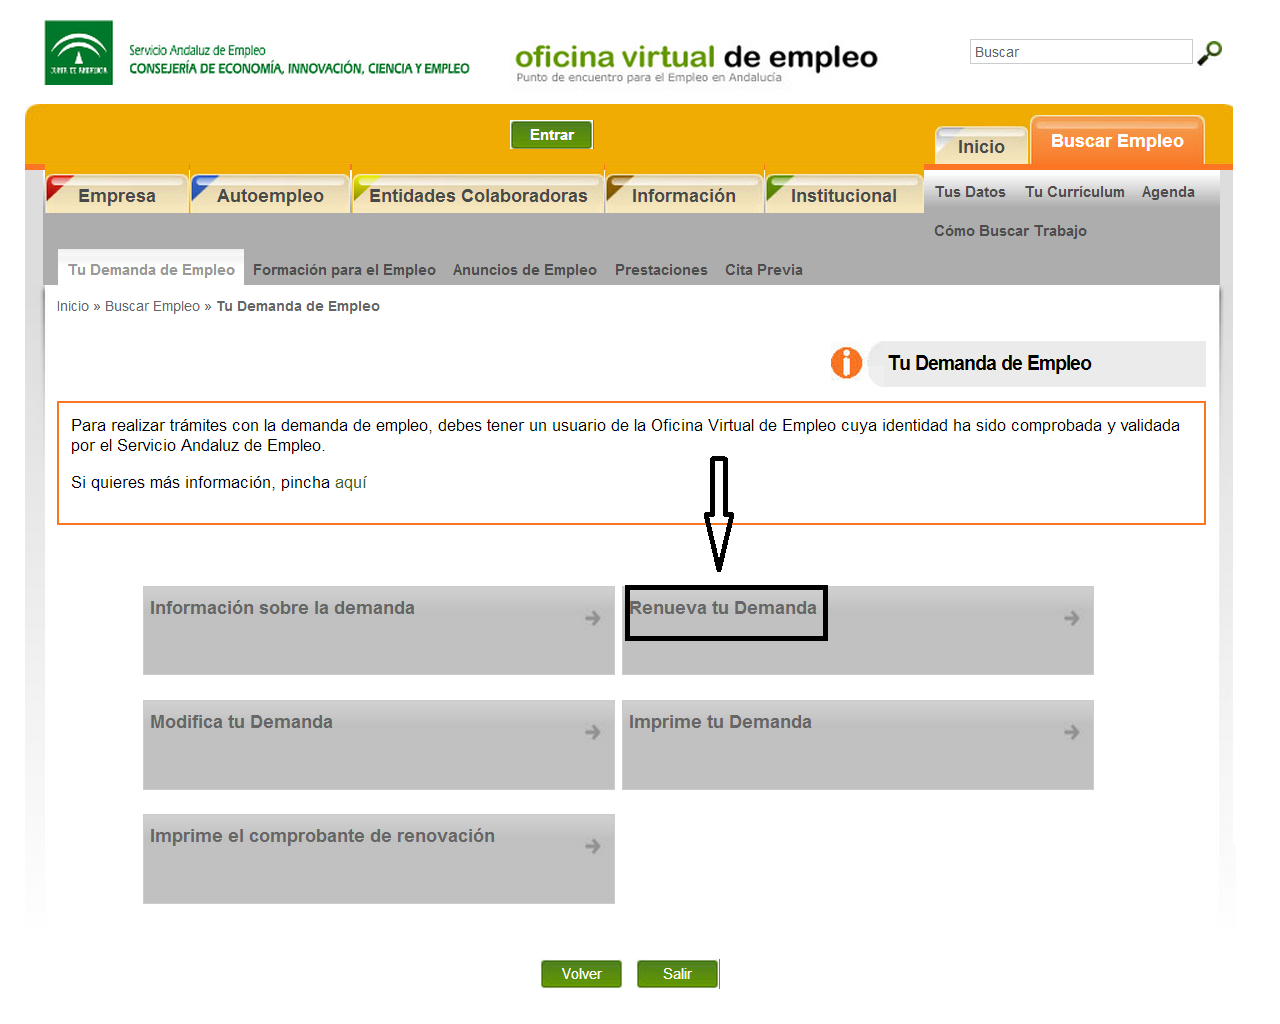 Pasos a seguir para renovar la demanda de empleo por for Oficina virtual de enpleo